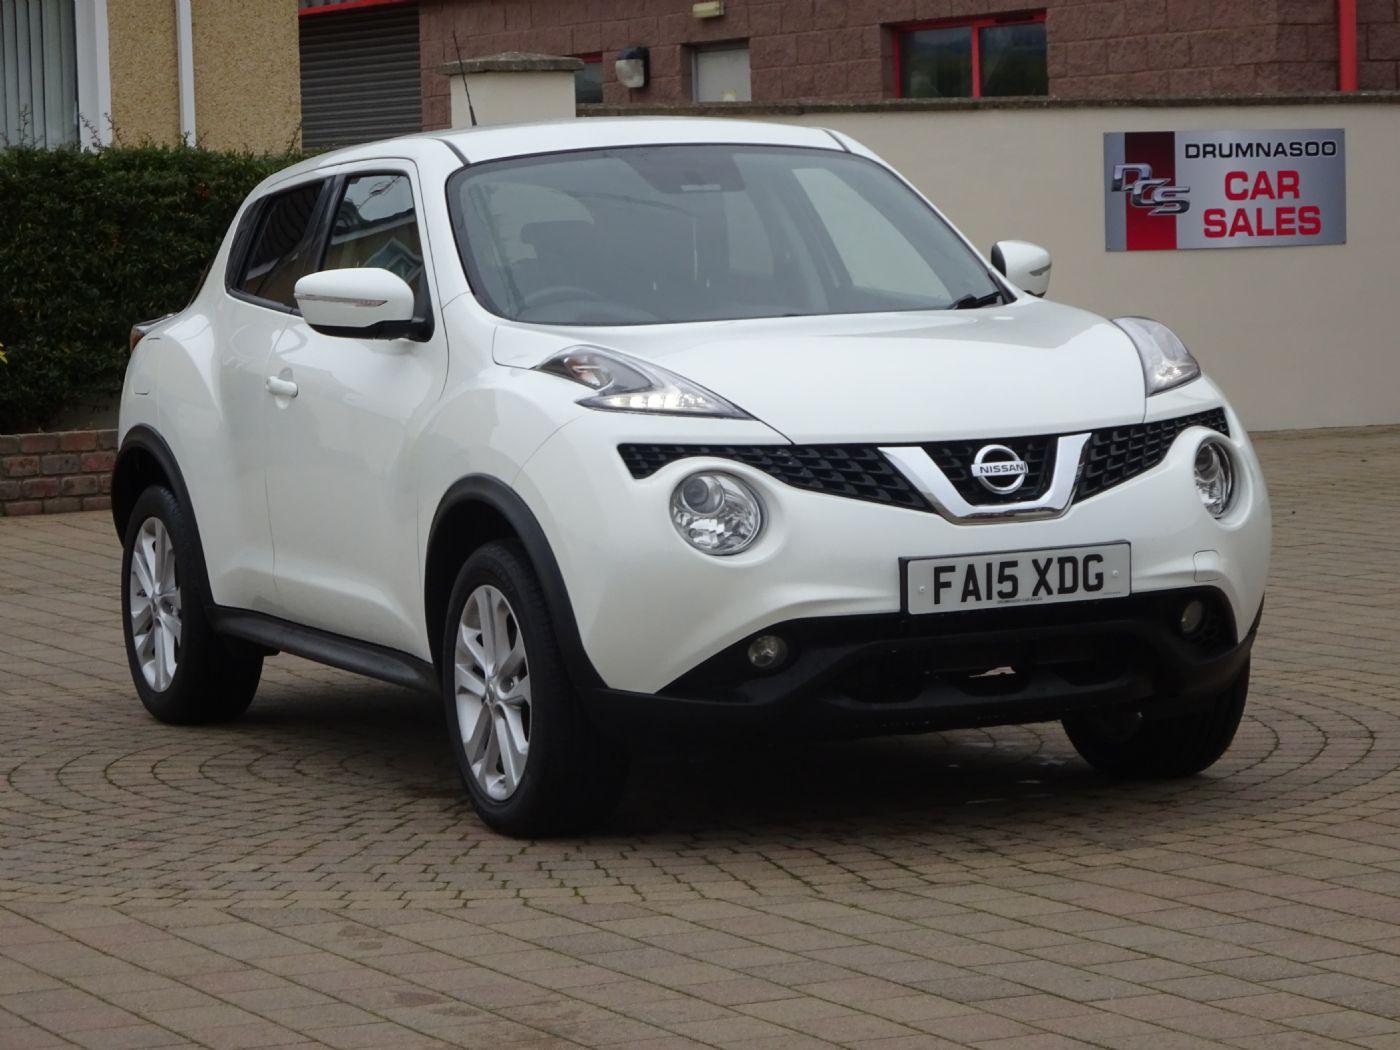 Nissan Juke Acenta 1.5  DCI , Alloys, Cruise Control, £20 Road Tax